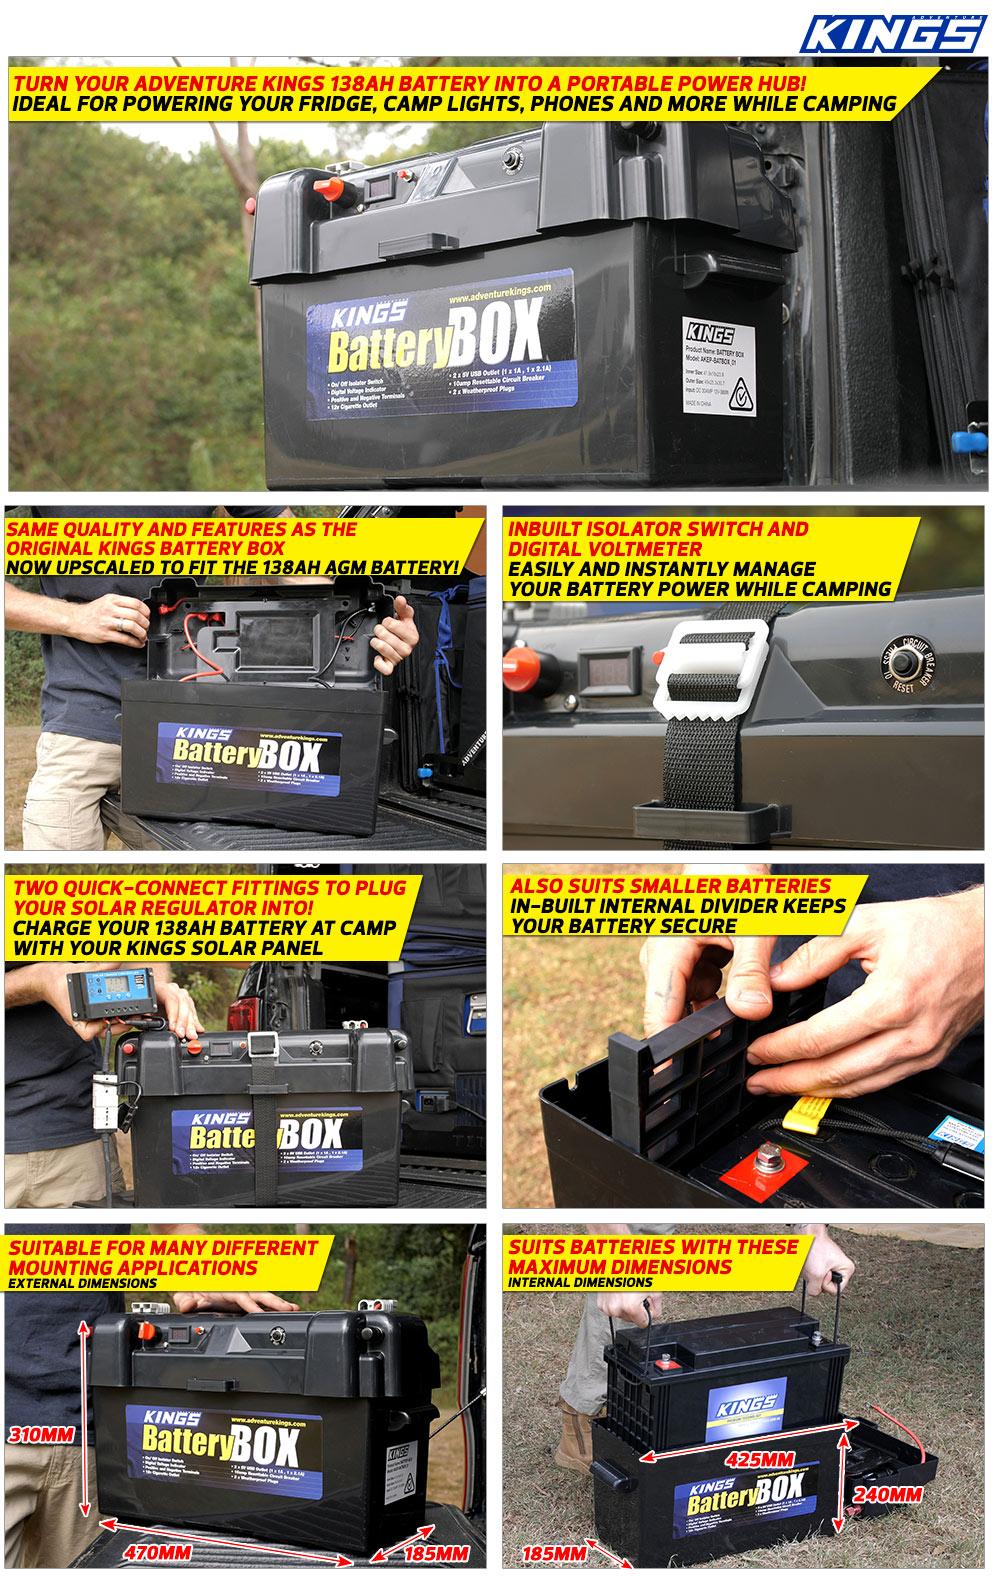 Adventure Kings Maxi Battery Box